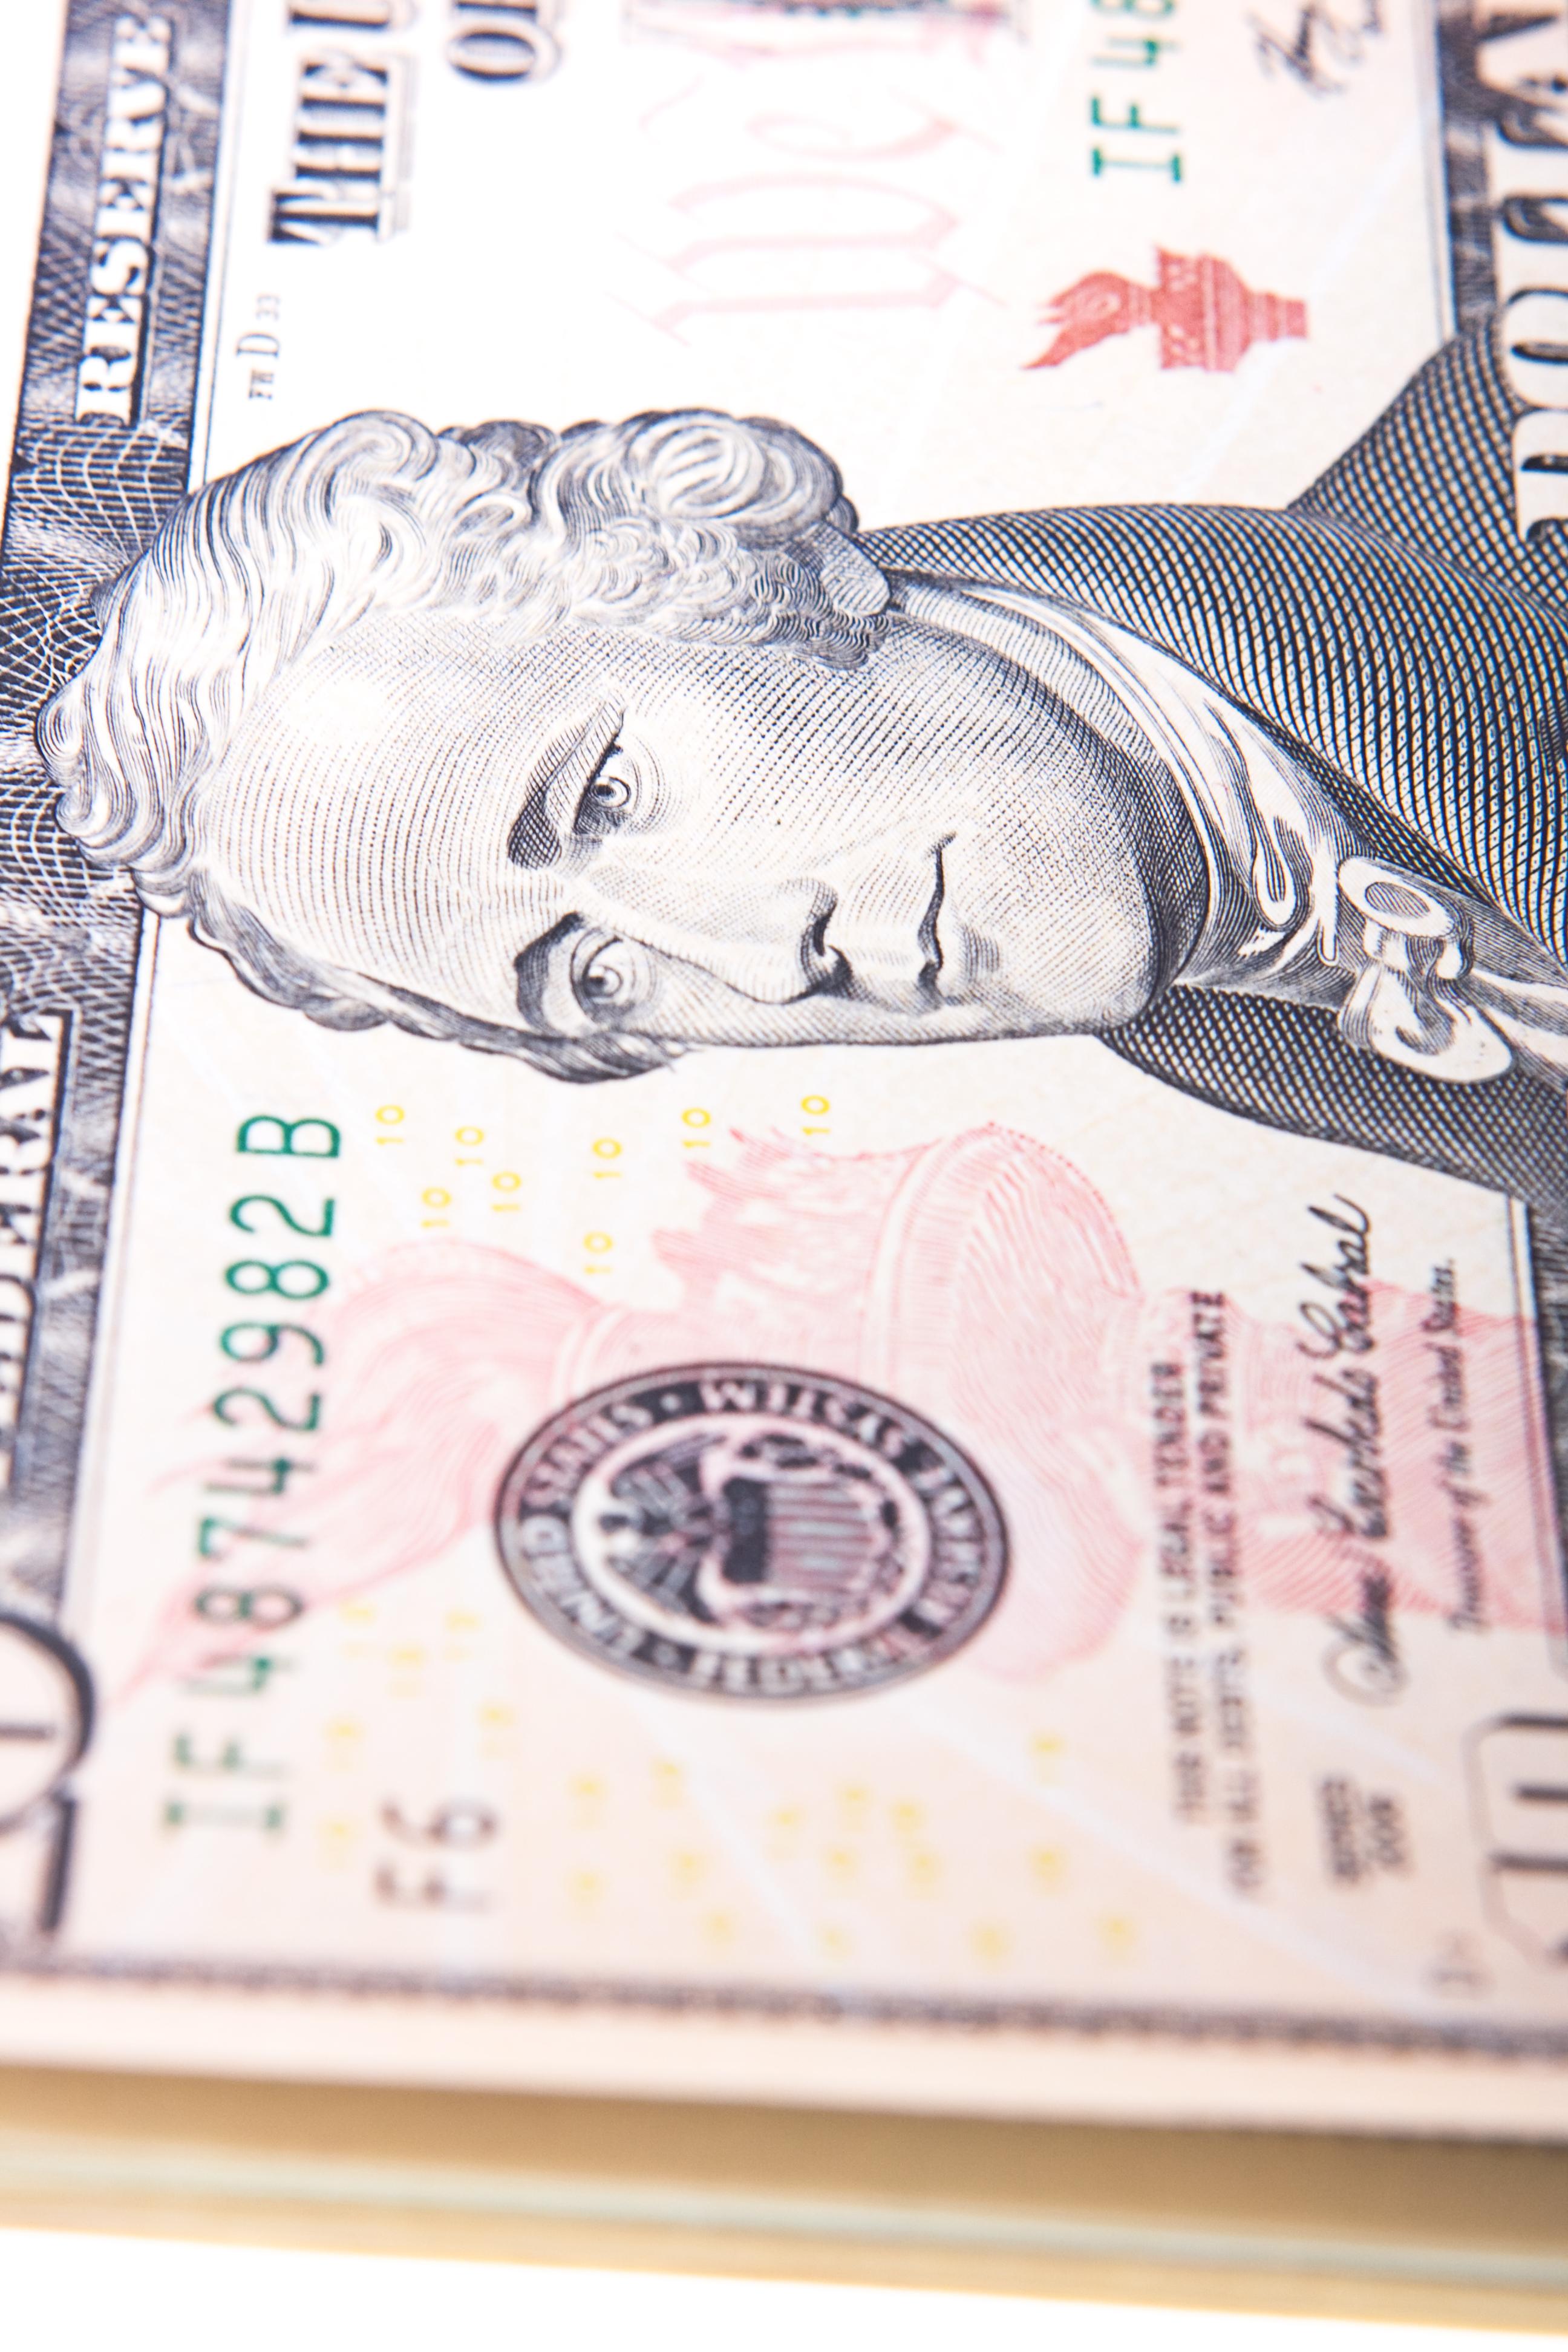 Ten dollar bill photo